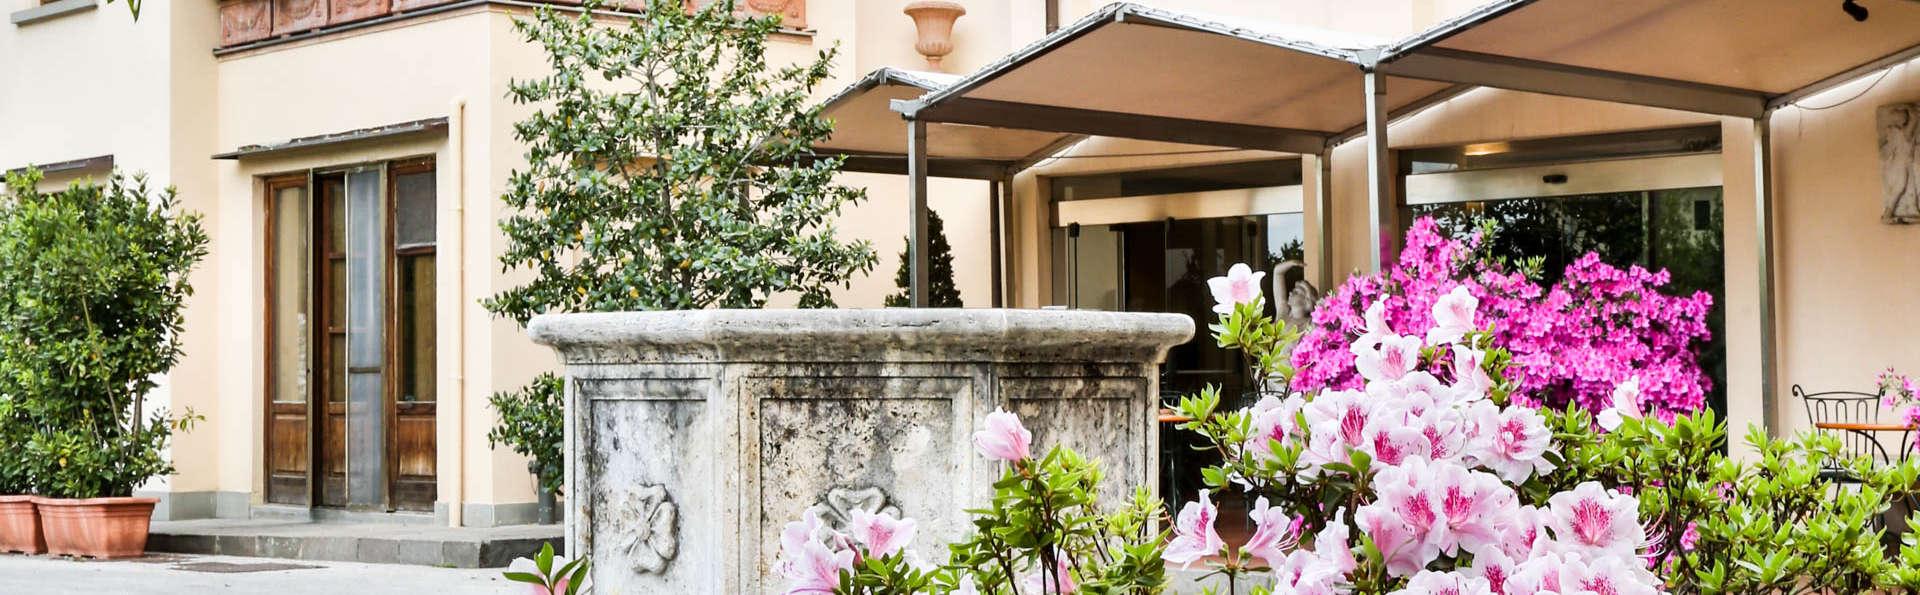 Ambiance romantique à la Villa Gabriele D'Annunzio